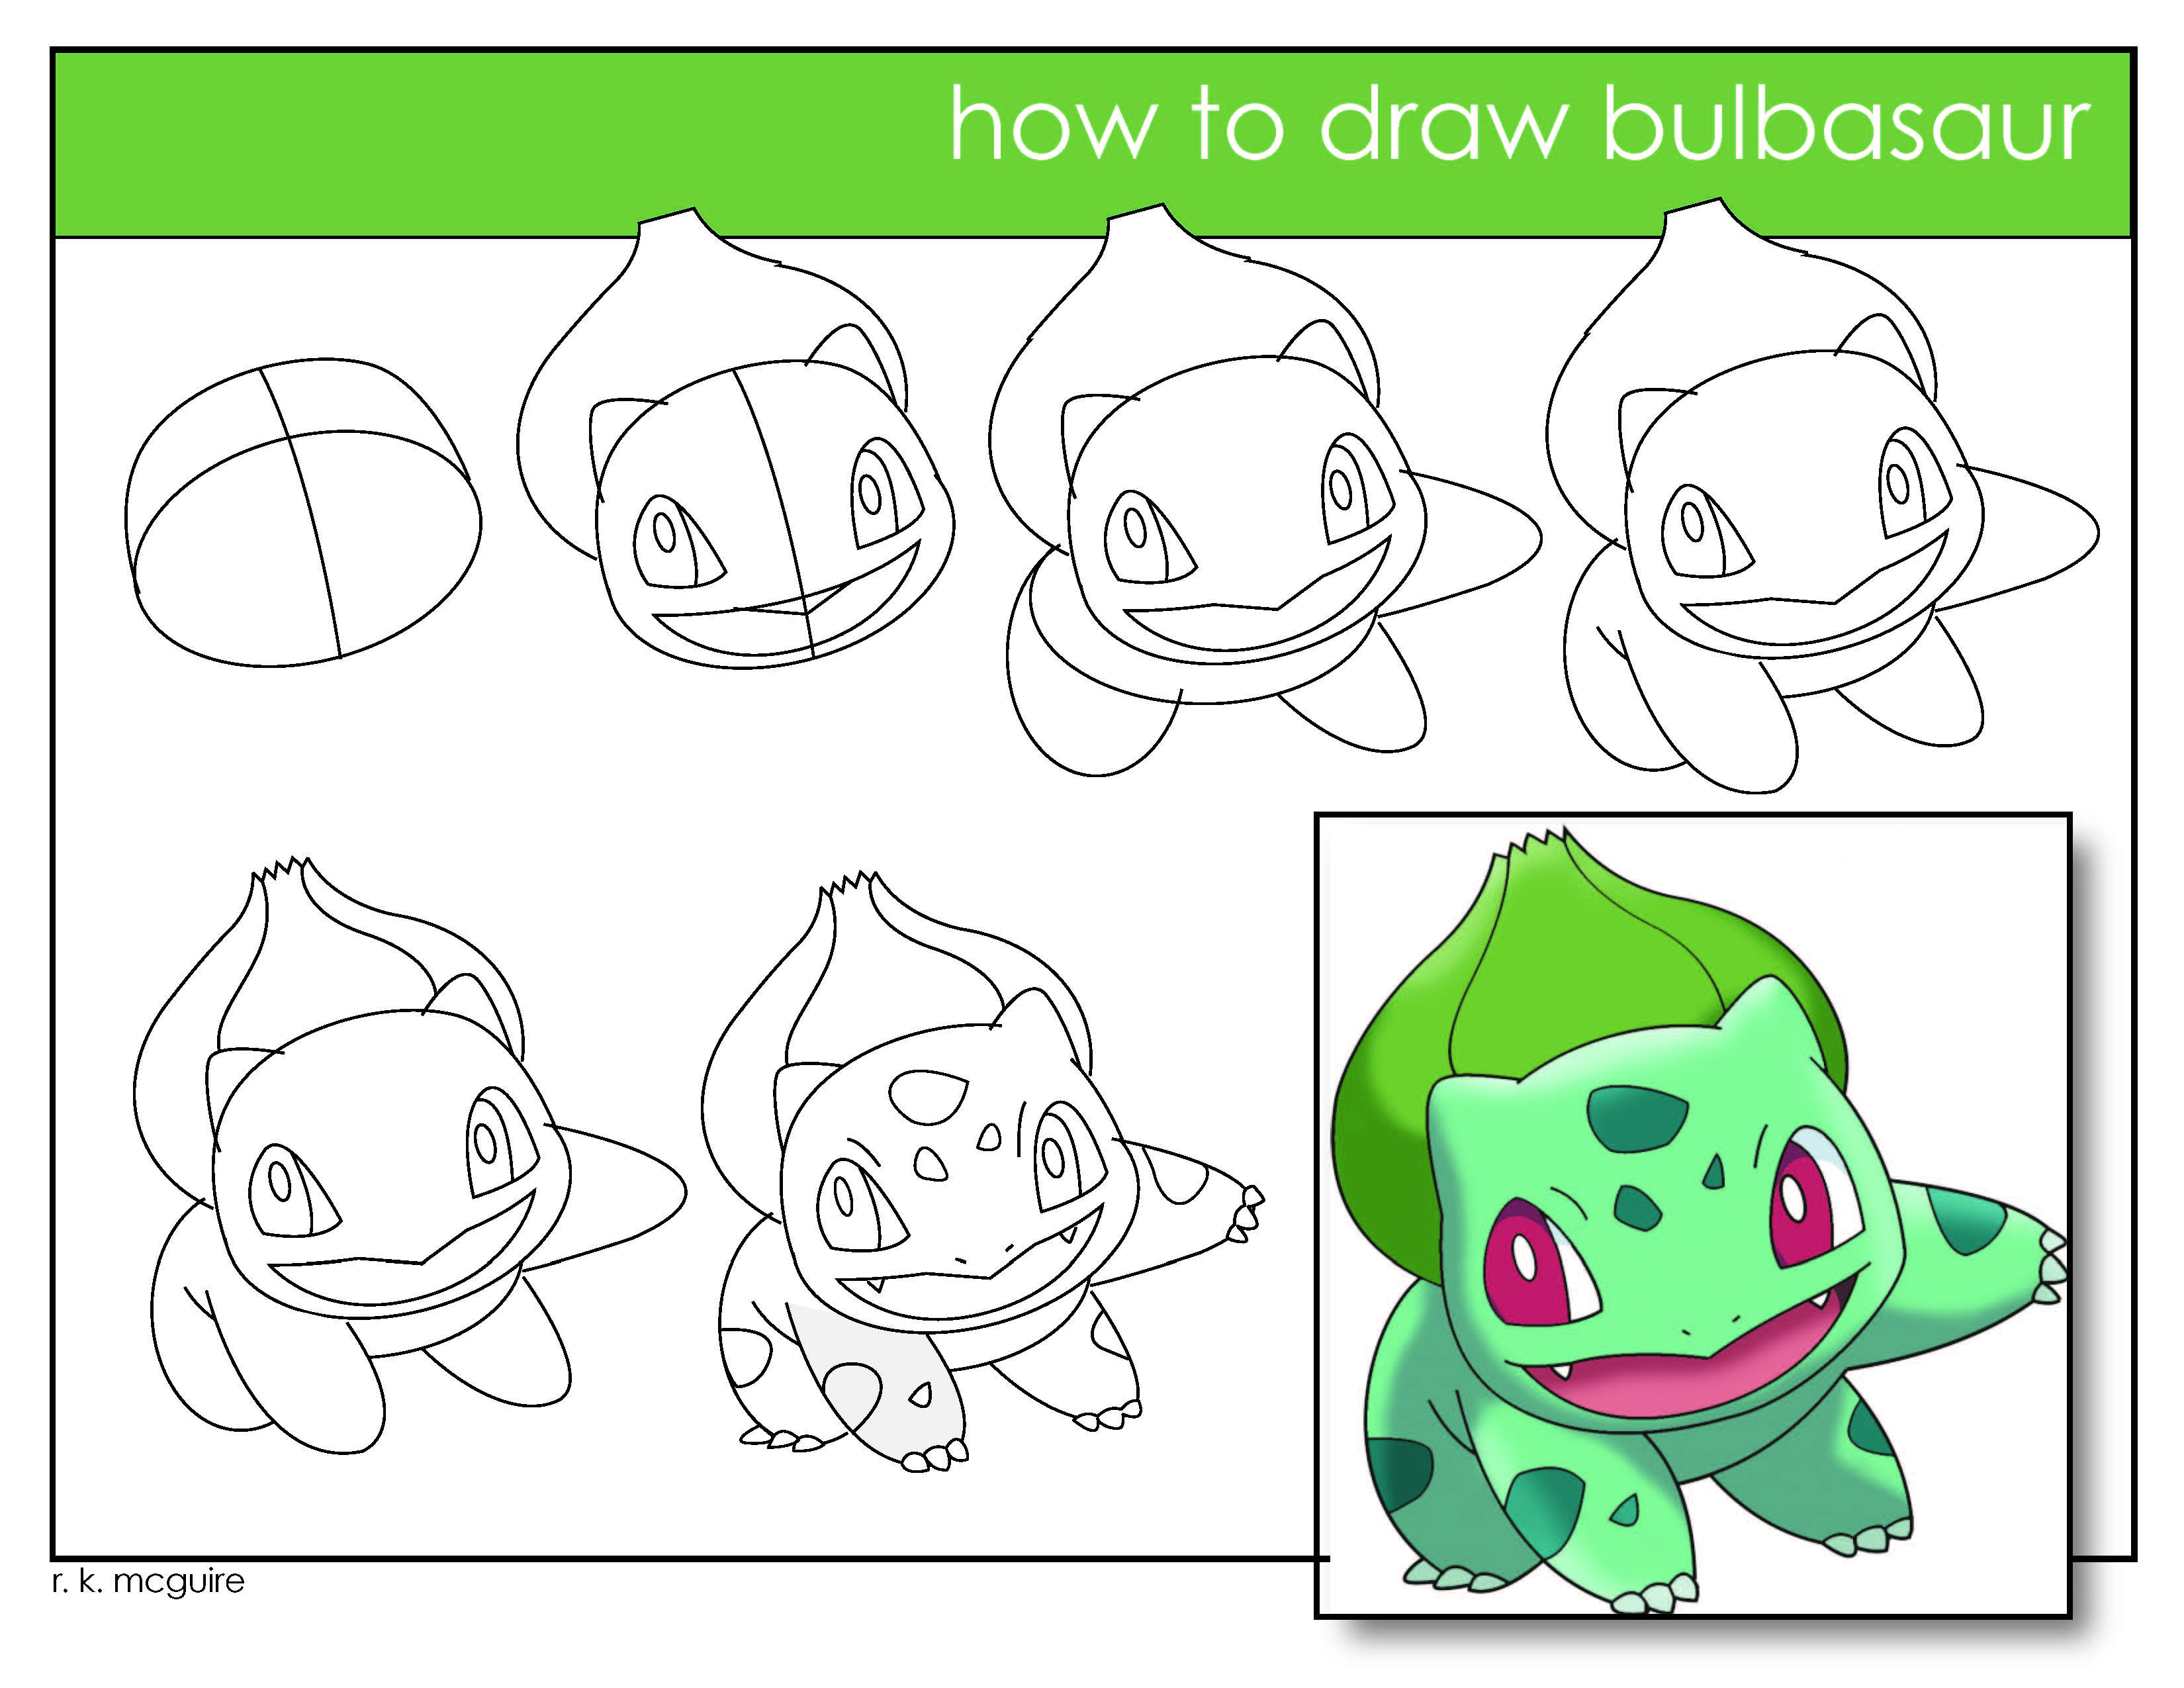 3300x2550 Speed Drawing Bulbasaur Pokemon R K Mcguire